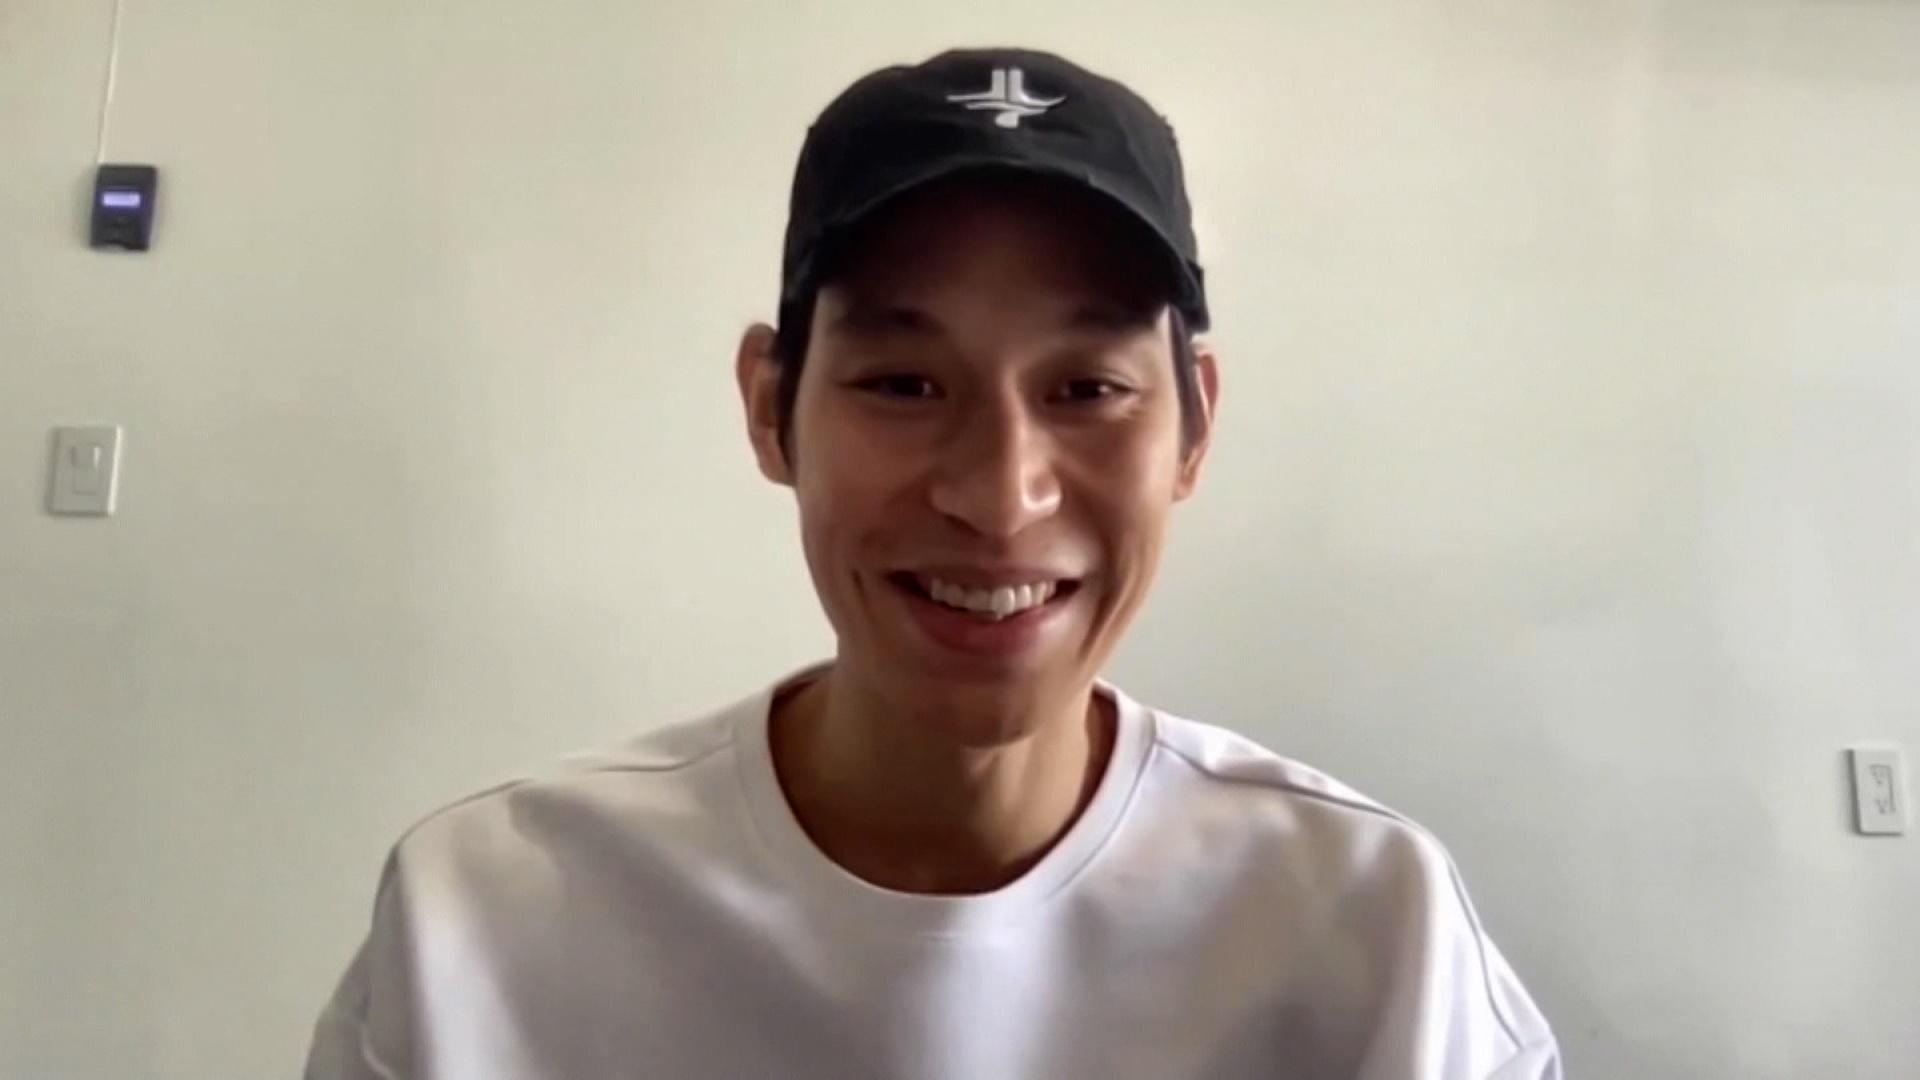 Pro Basketball Player Jeremy Lin on Anti-Asian Racism